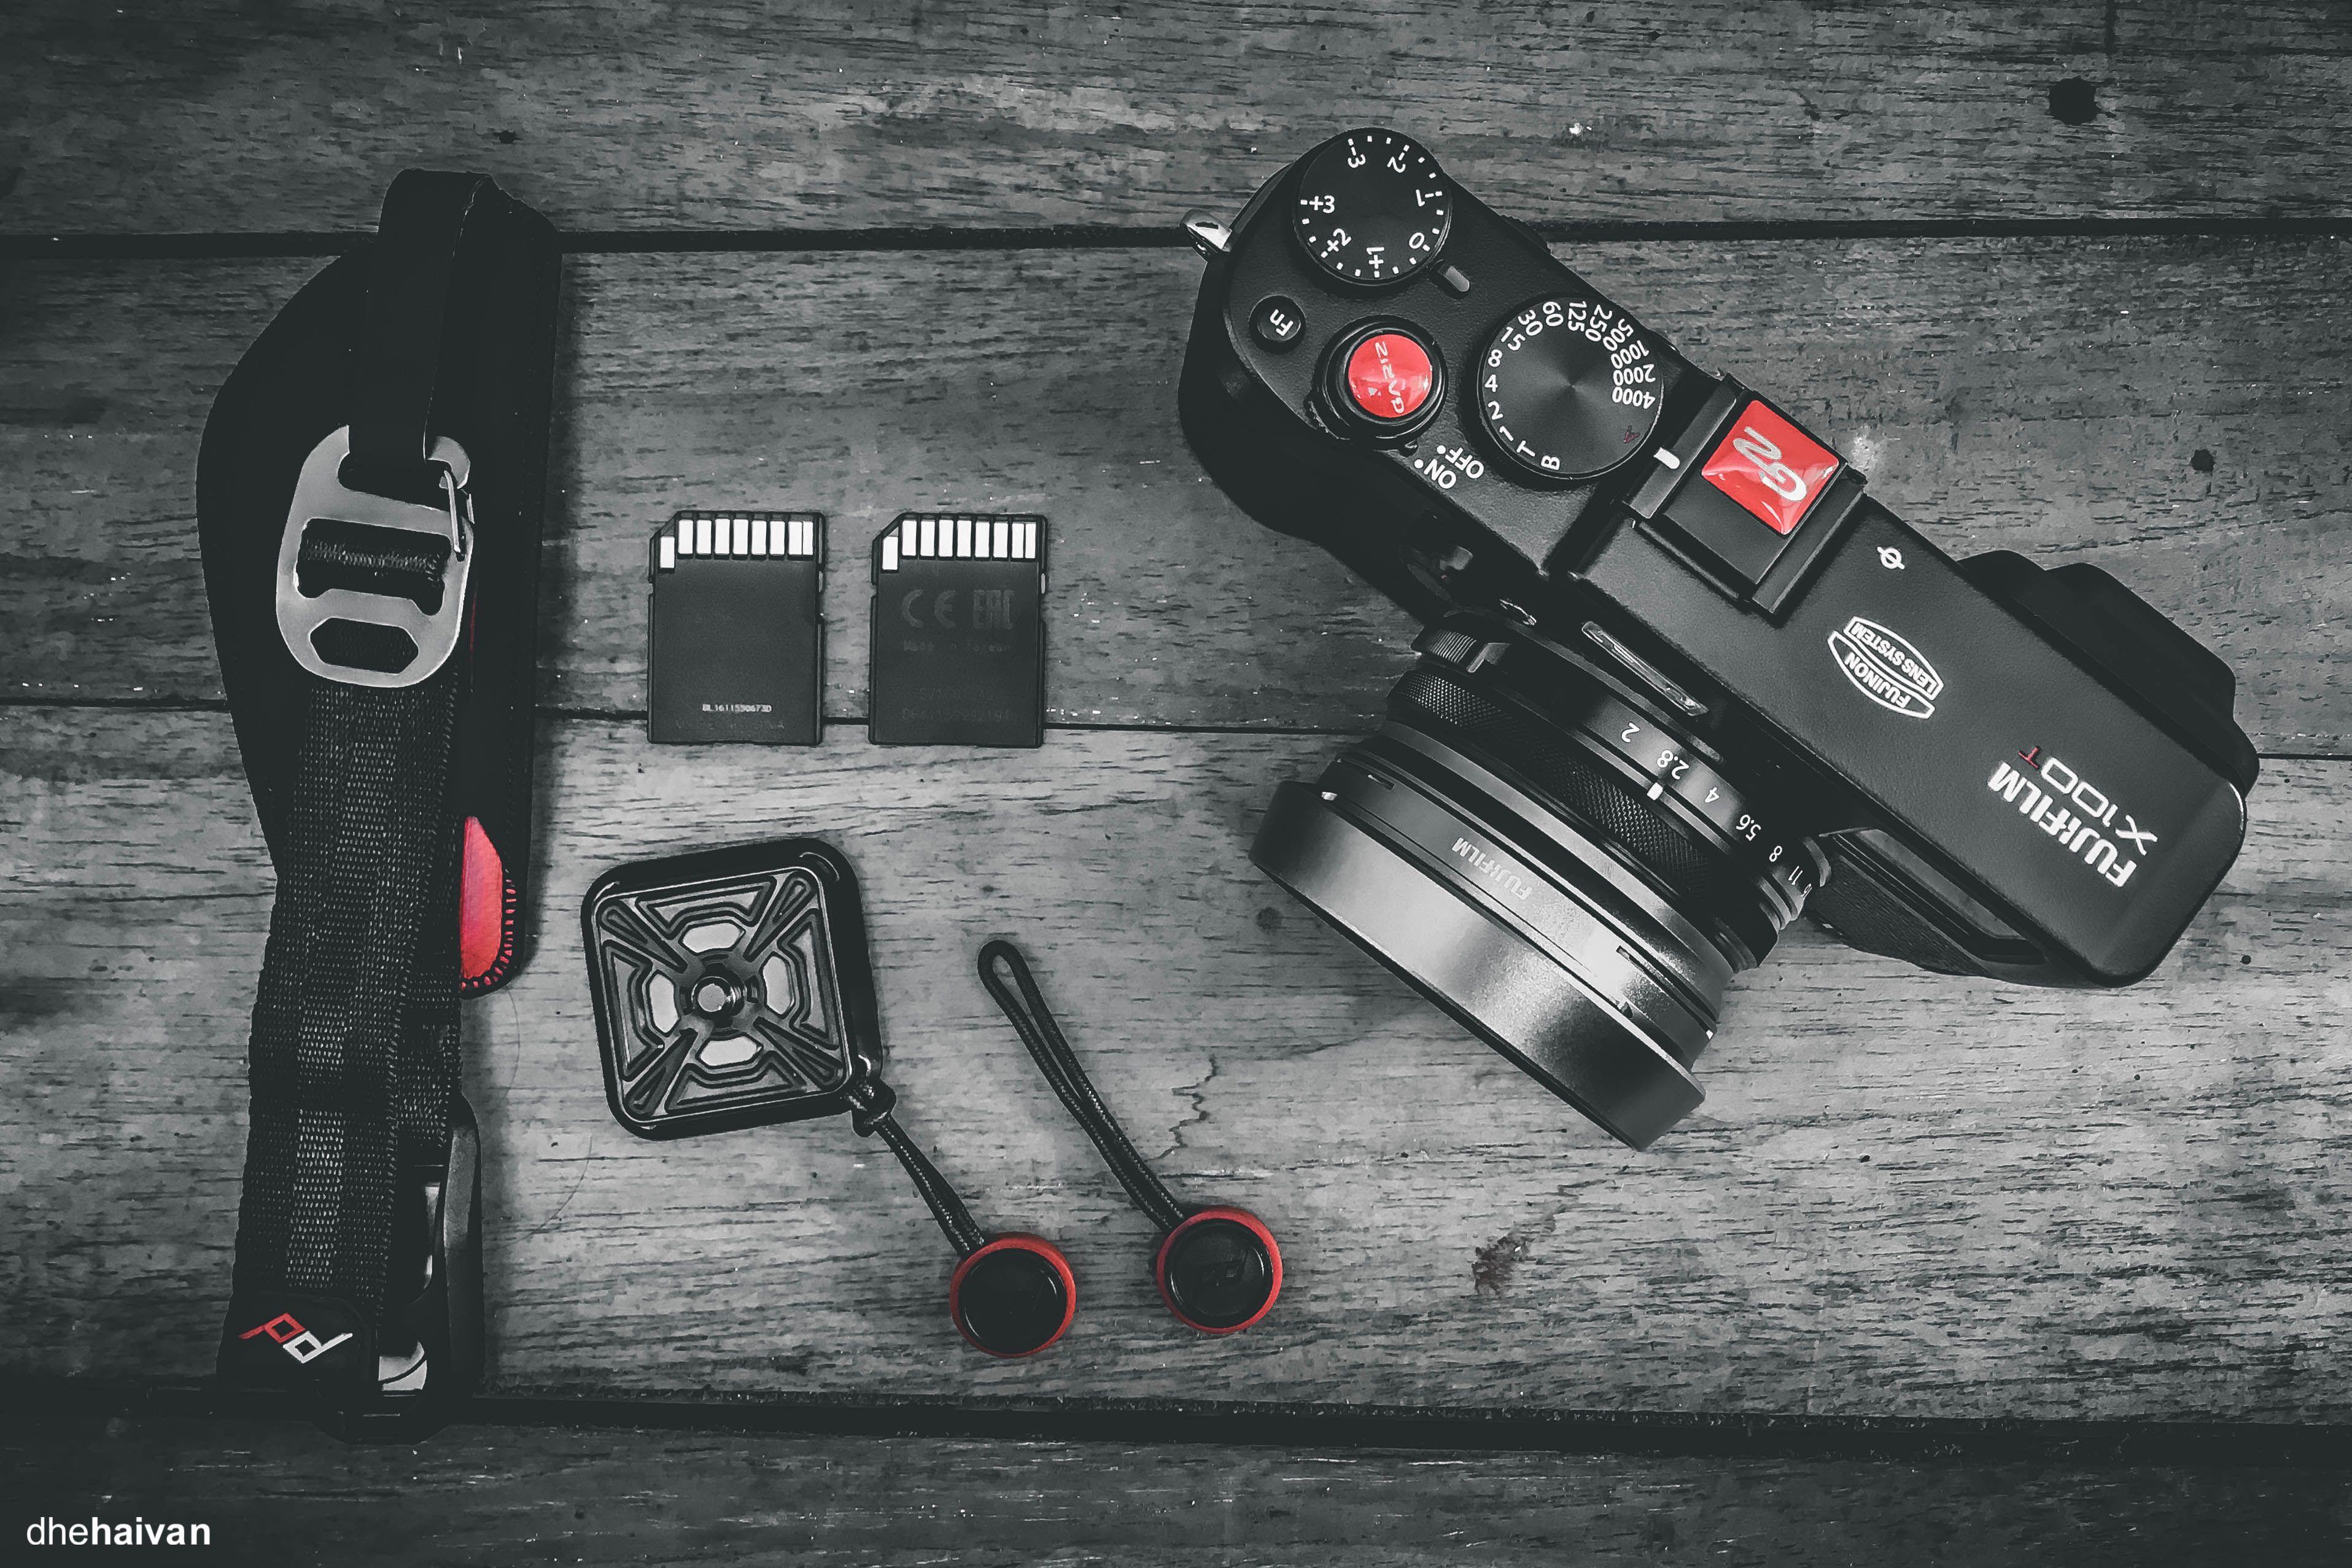 My Daily Essentials Setup For Streetphotography Fuji X100t Camera Fujifilm X100s Iphone 5 Custom Hard Case